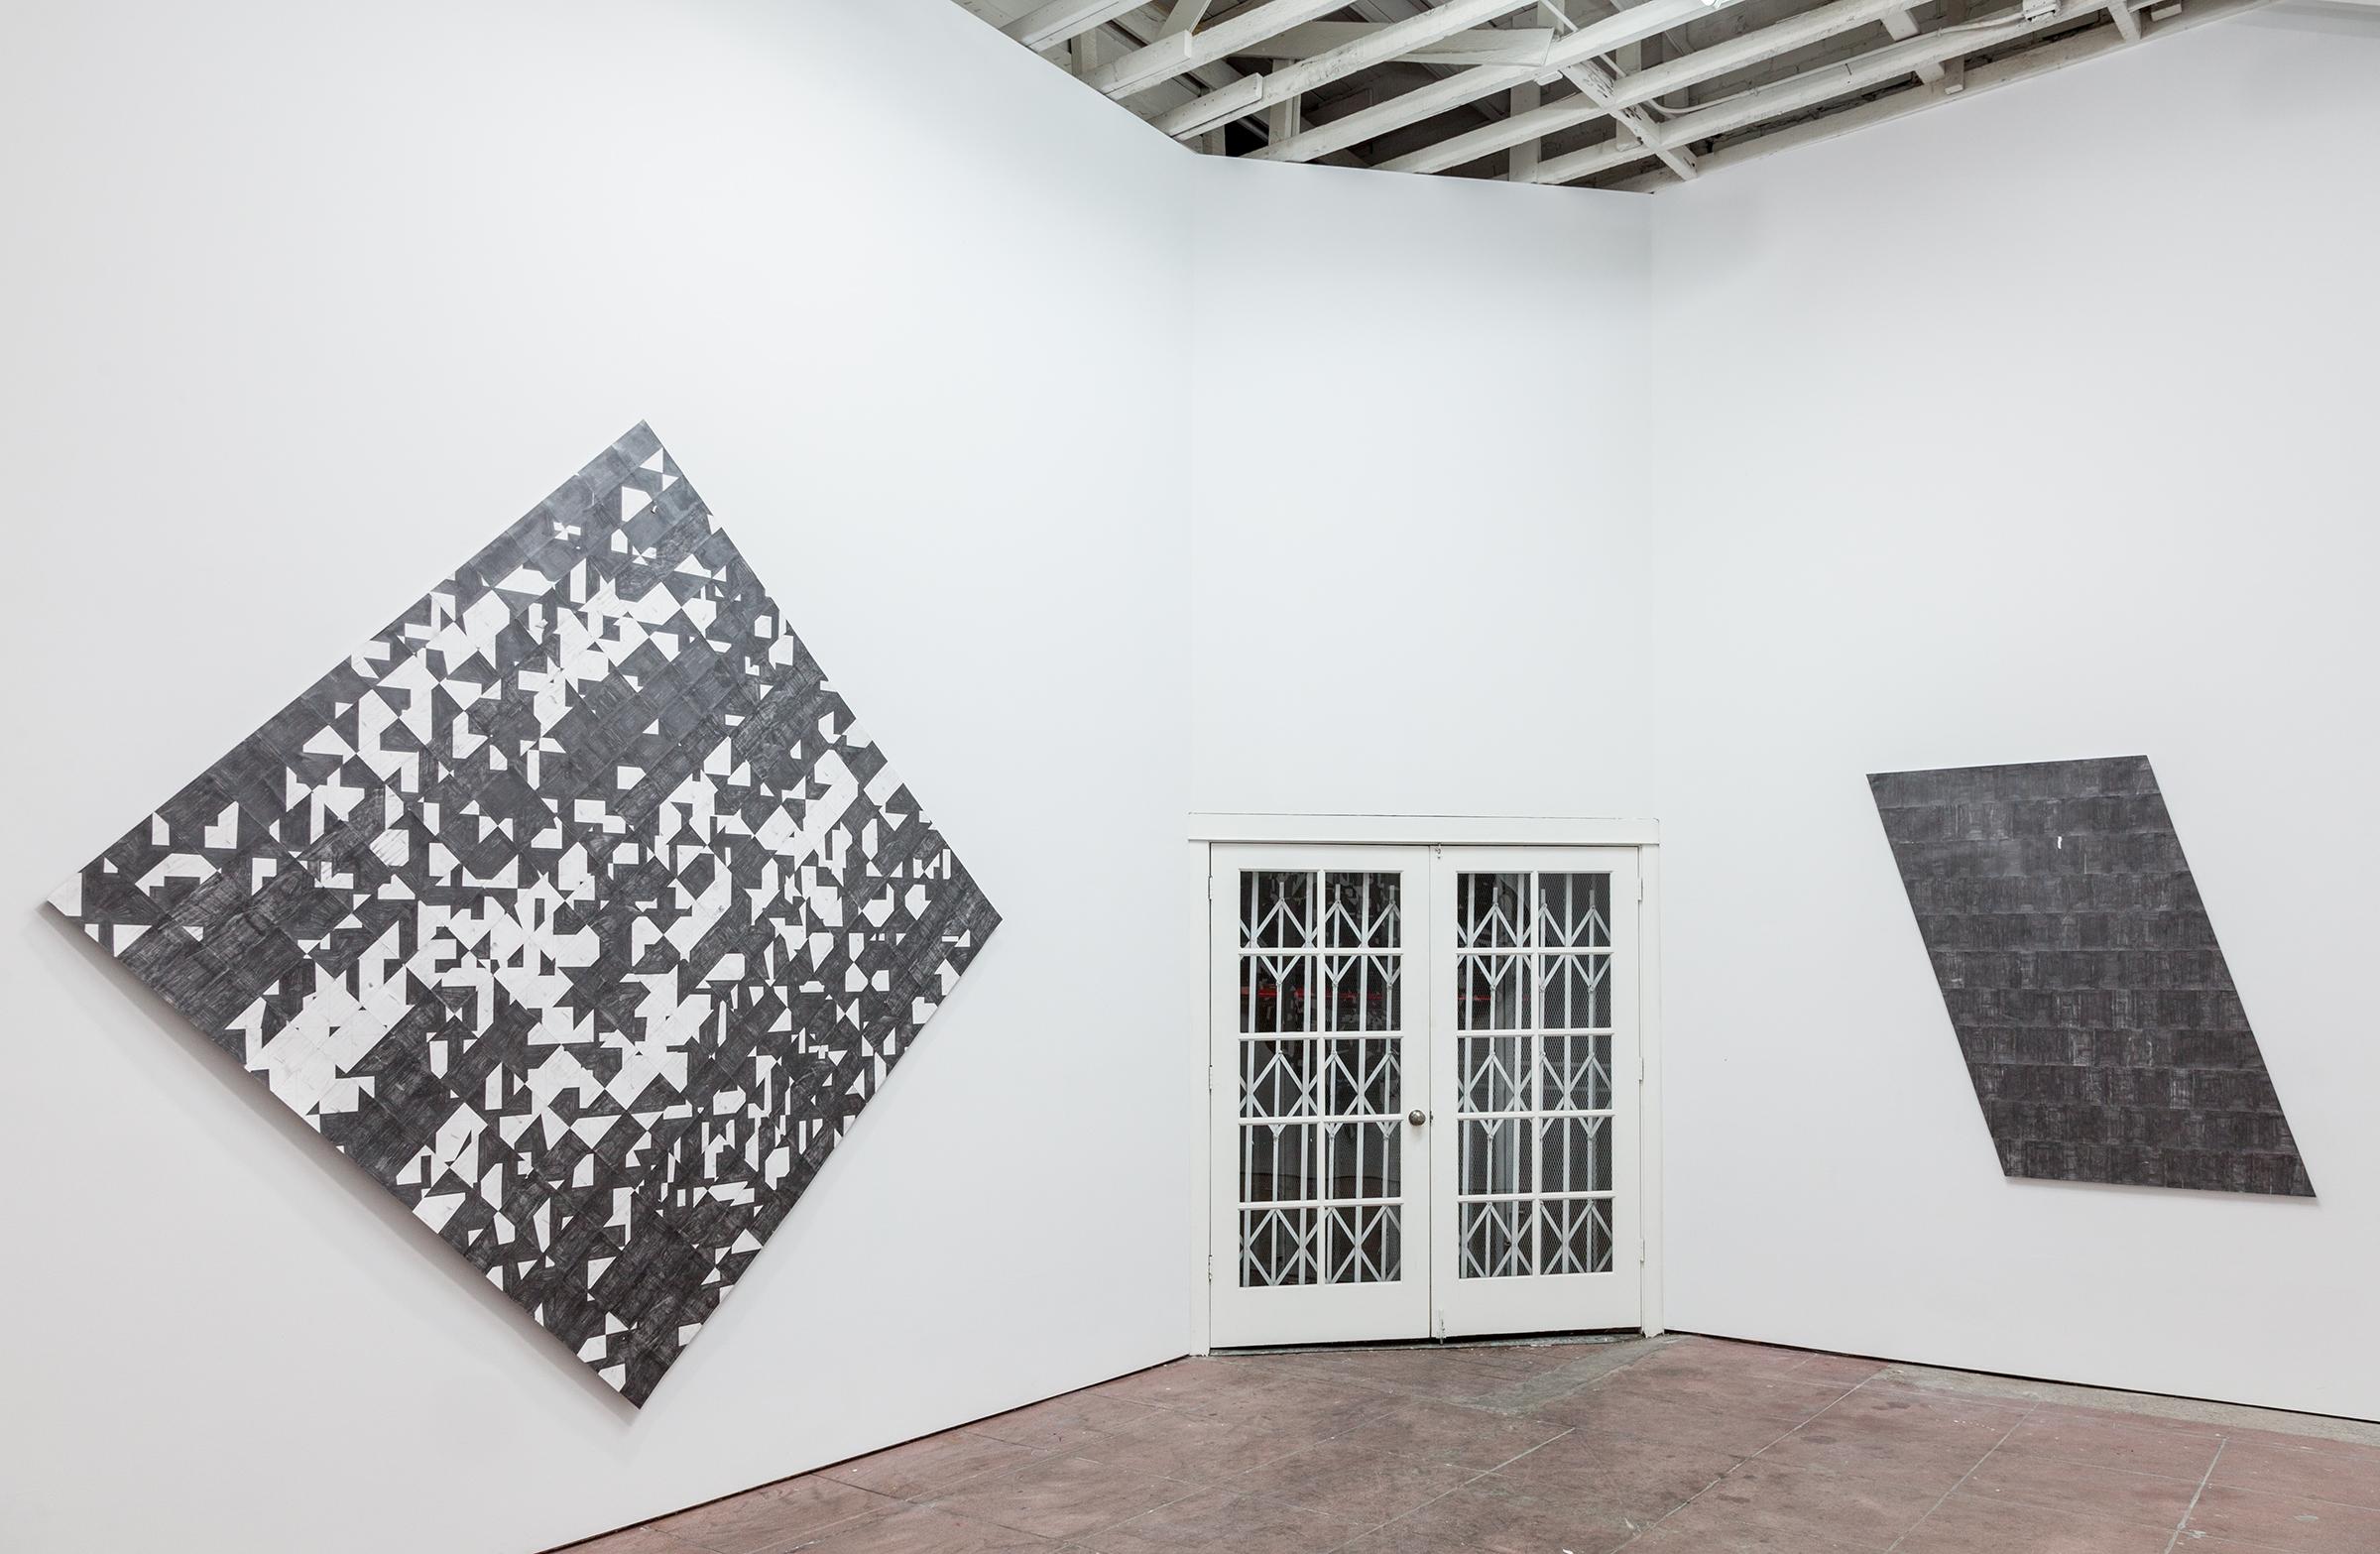 Installation view, Label the Shapes, Martos Gallery, Los Angeles, 2015